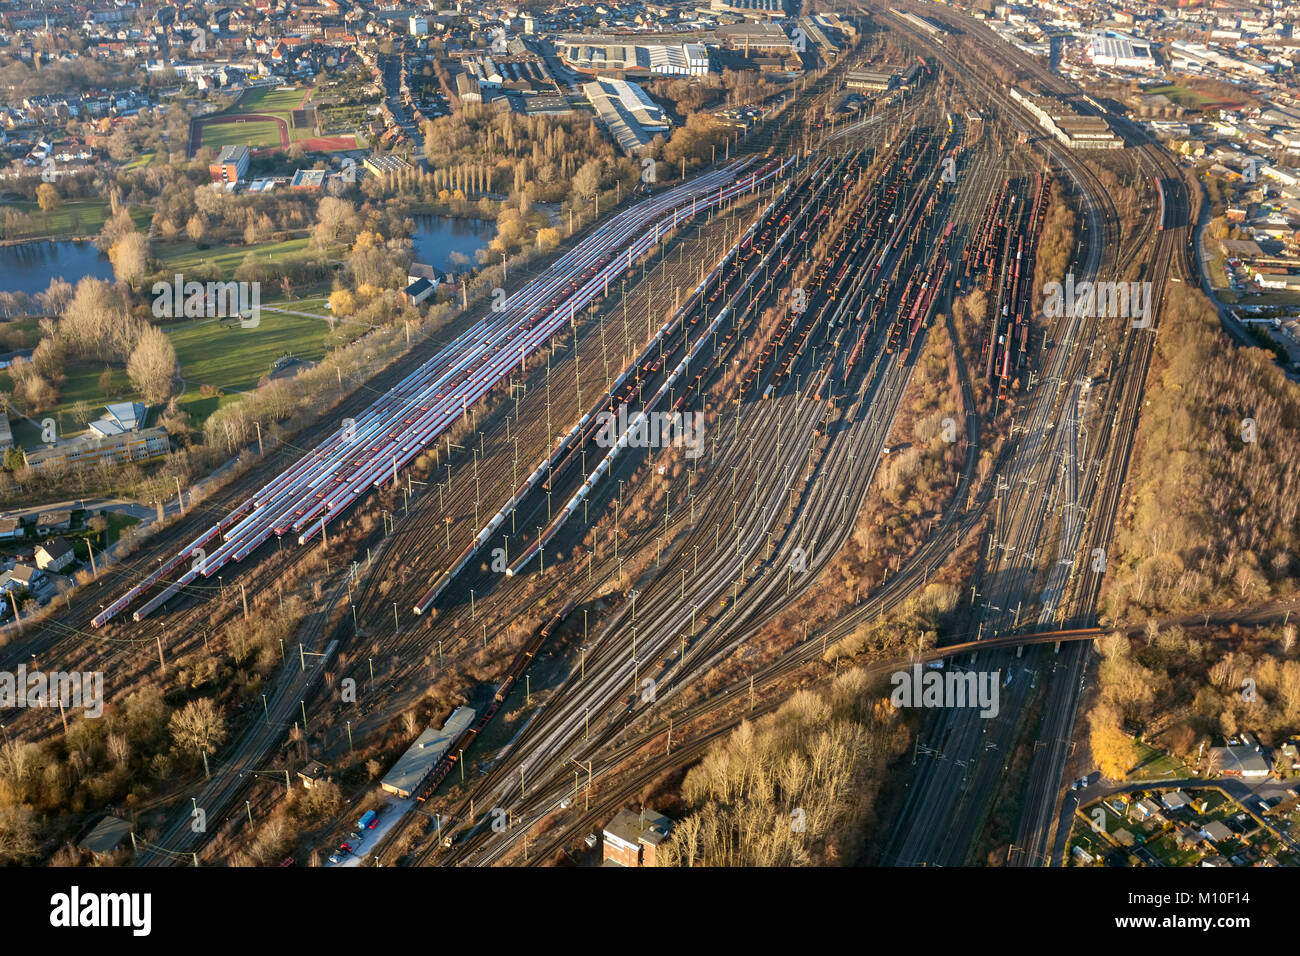 Aerial view, Hamm freight yard, railway tracks, railway yard, waggons, Hamm, Ruhr area, North Rhine-Westphalia, - Stock Image